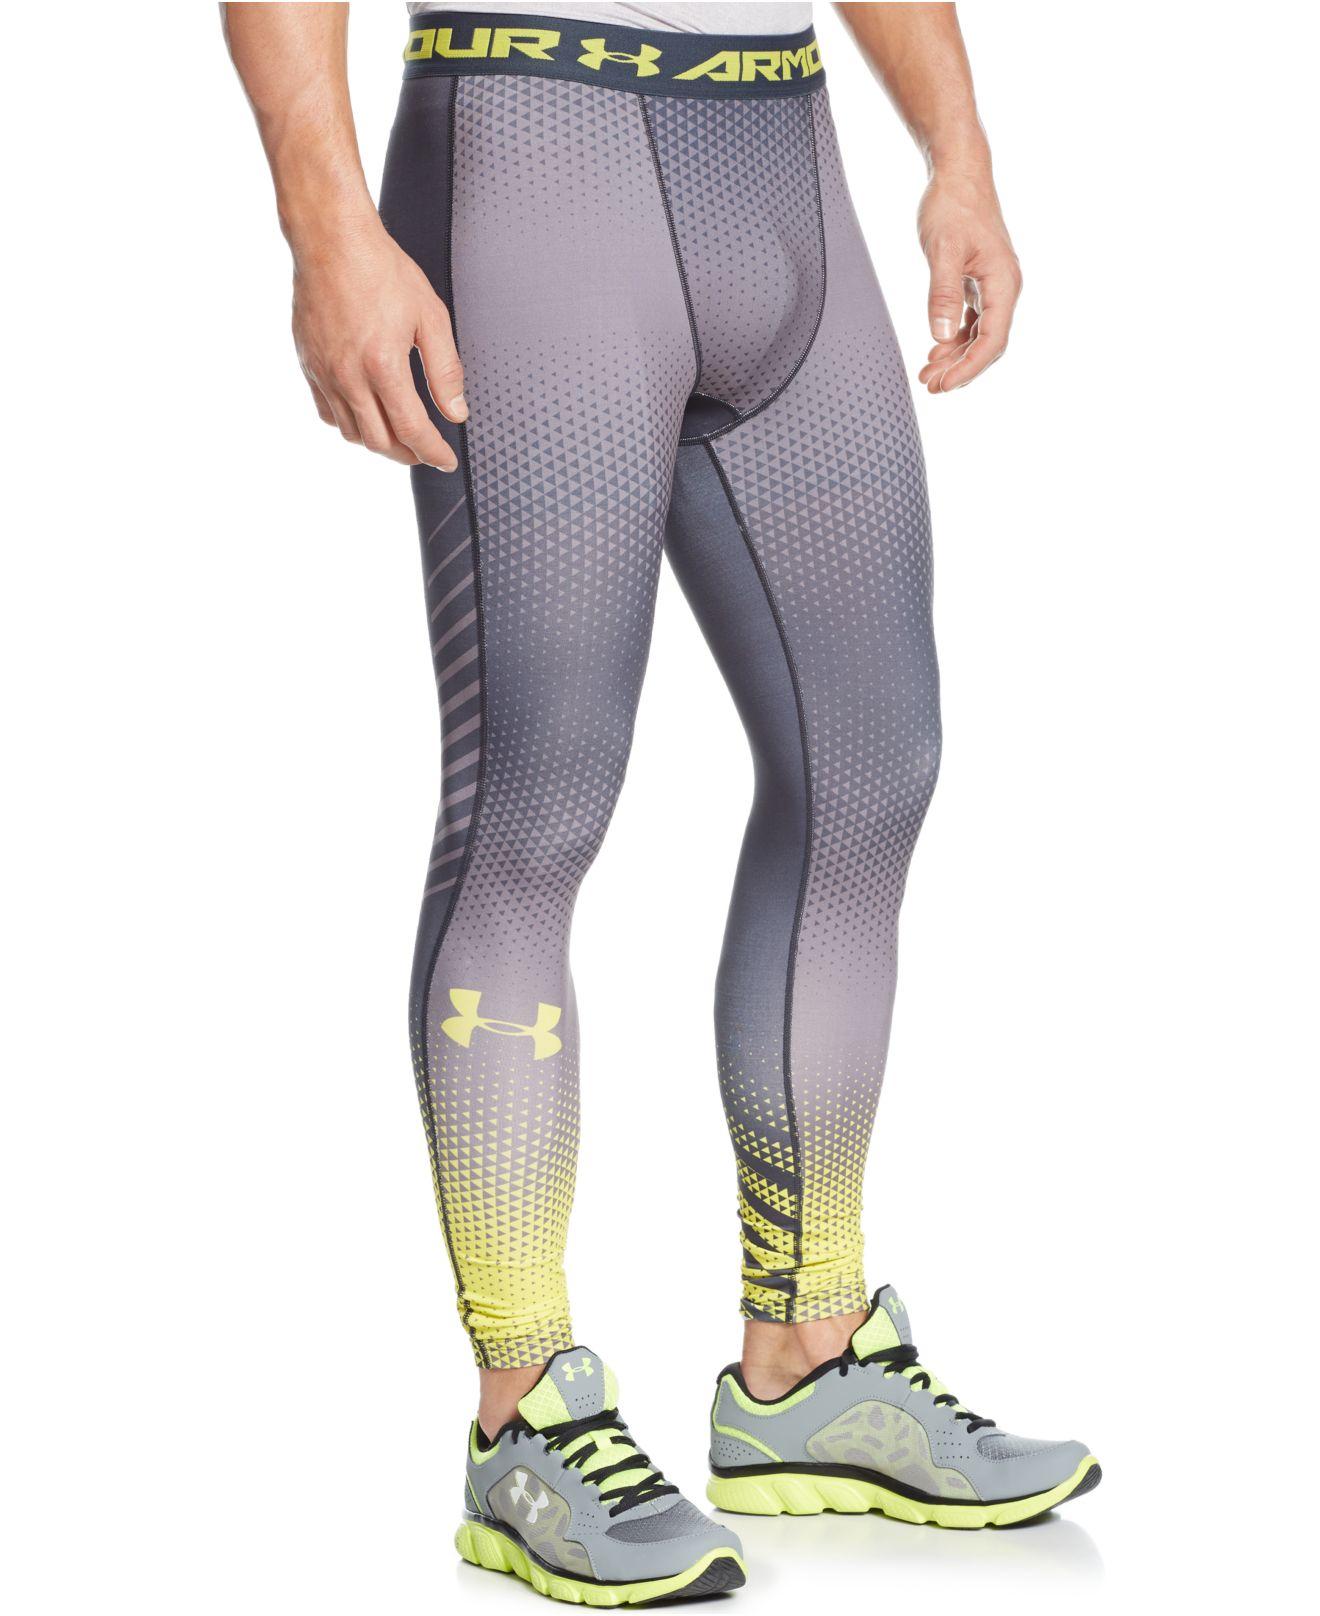 c88cbbb9c4ccb Under Armour Exo Heatgear Compression Leggings in Gray for Men - Lyst